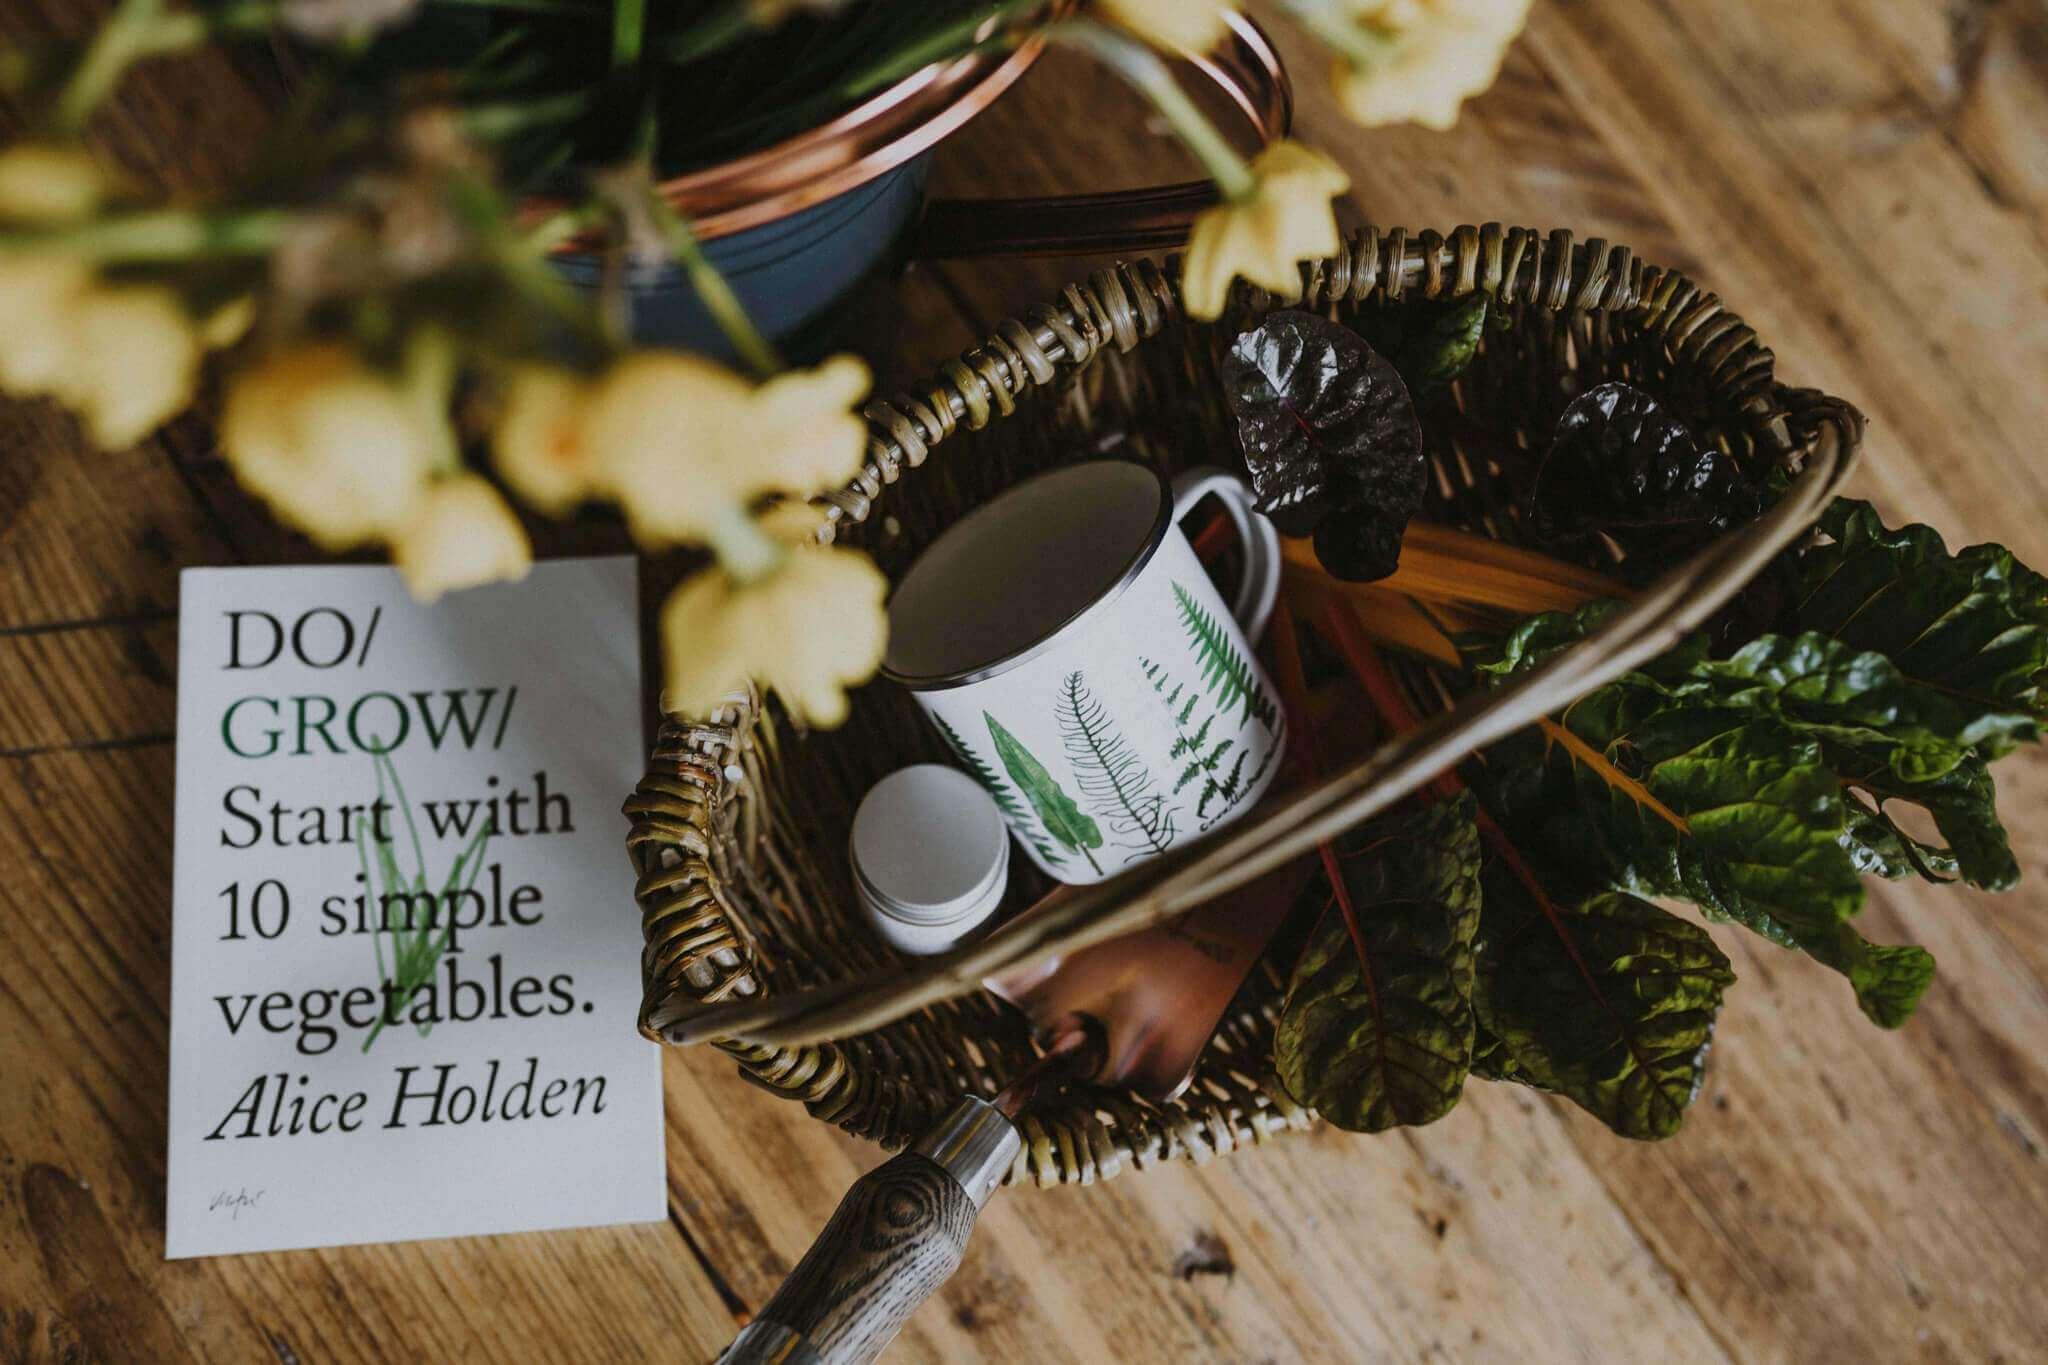 do grow book lifestyle shot